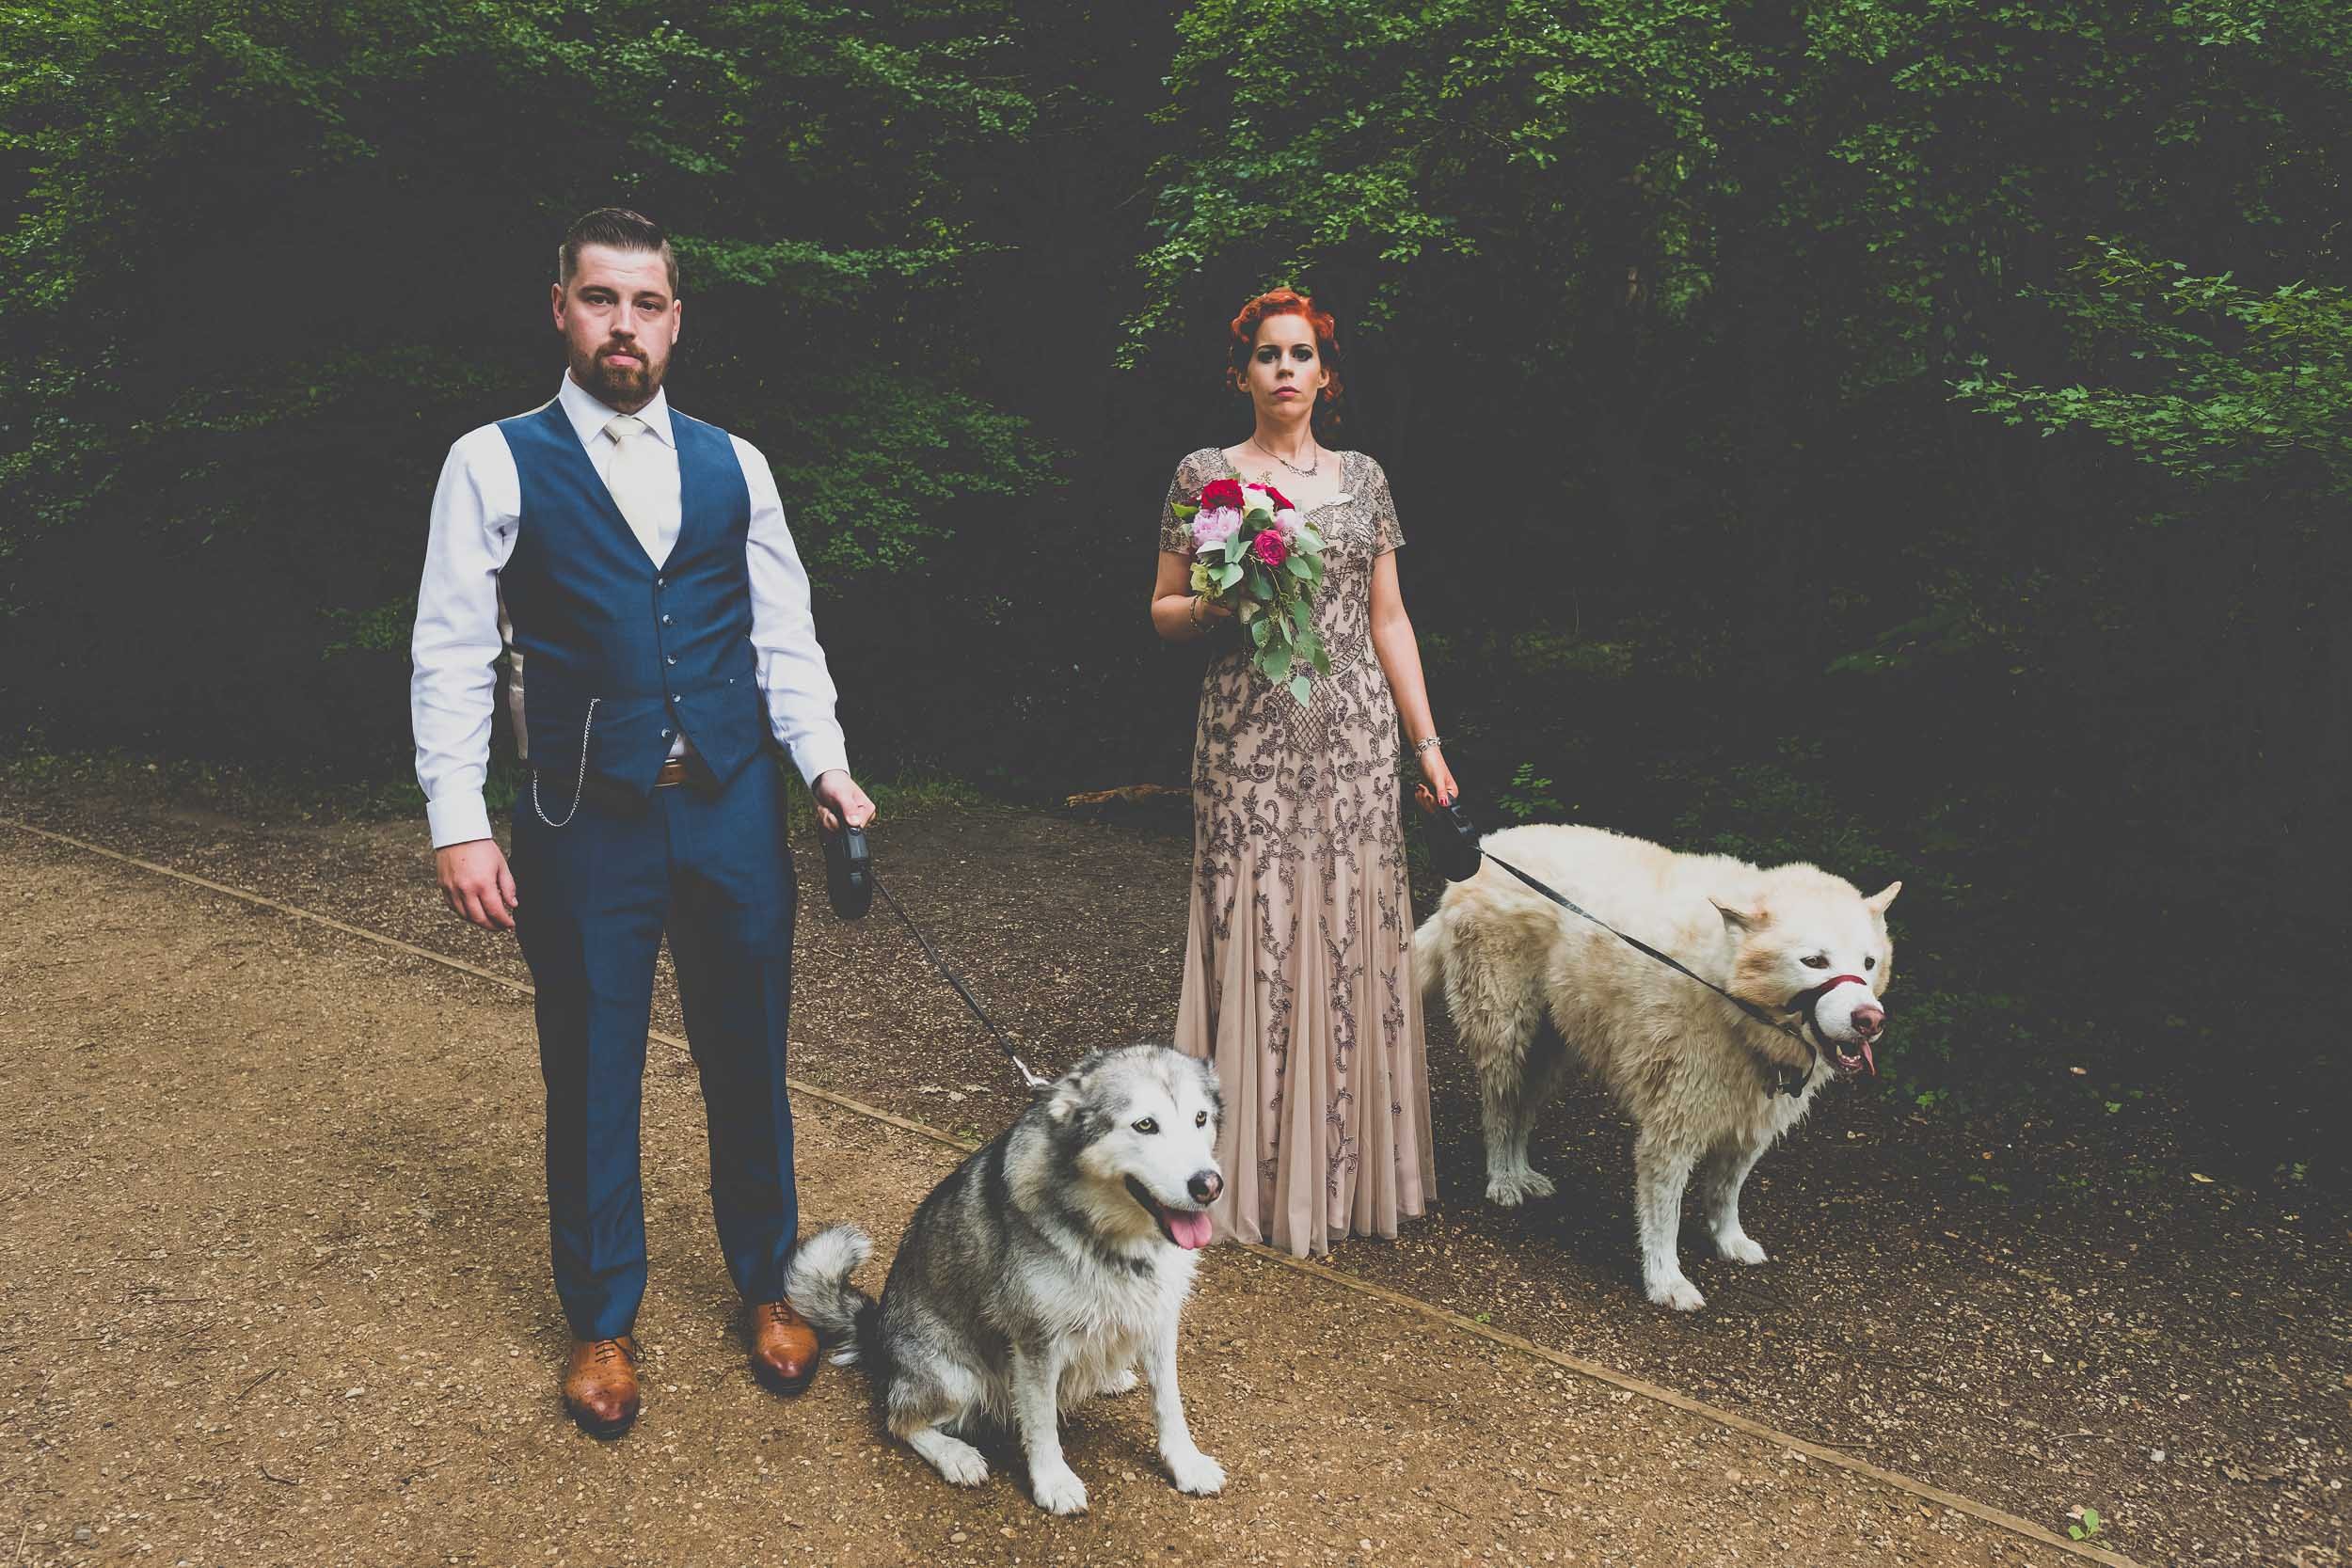 queen-elizabeths-hunting-lodge-epping-forest-wedding259.jpg